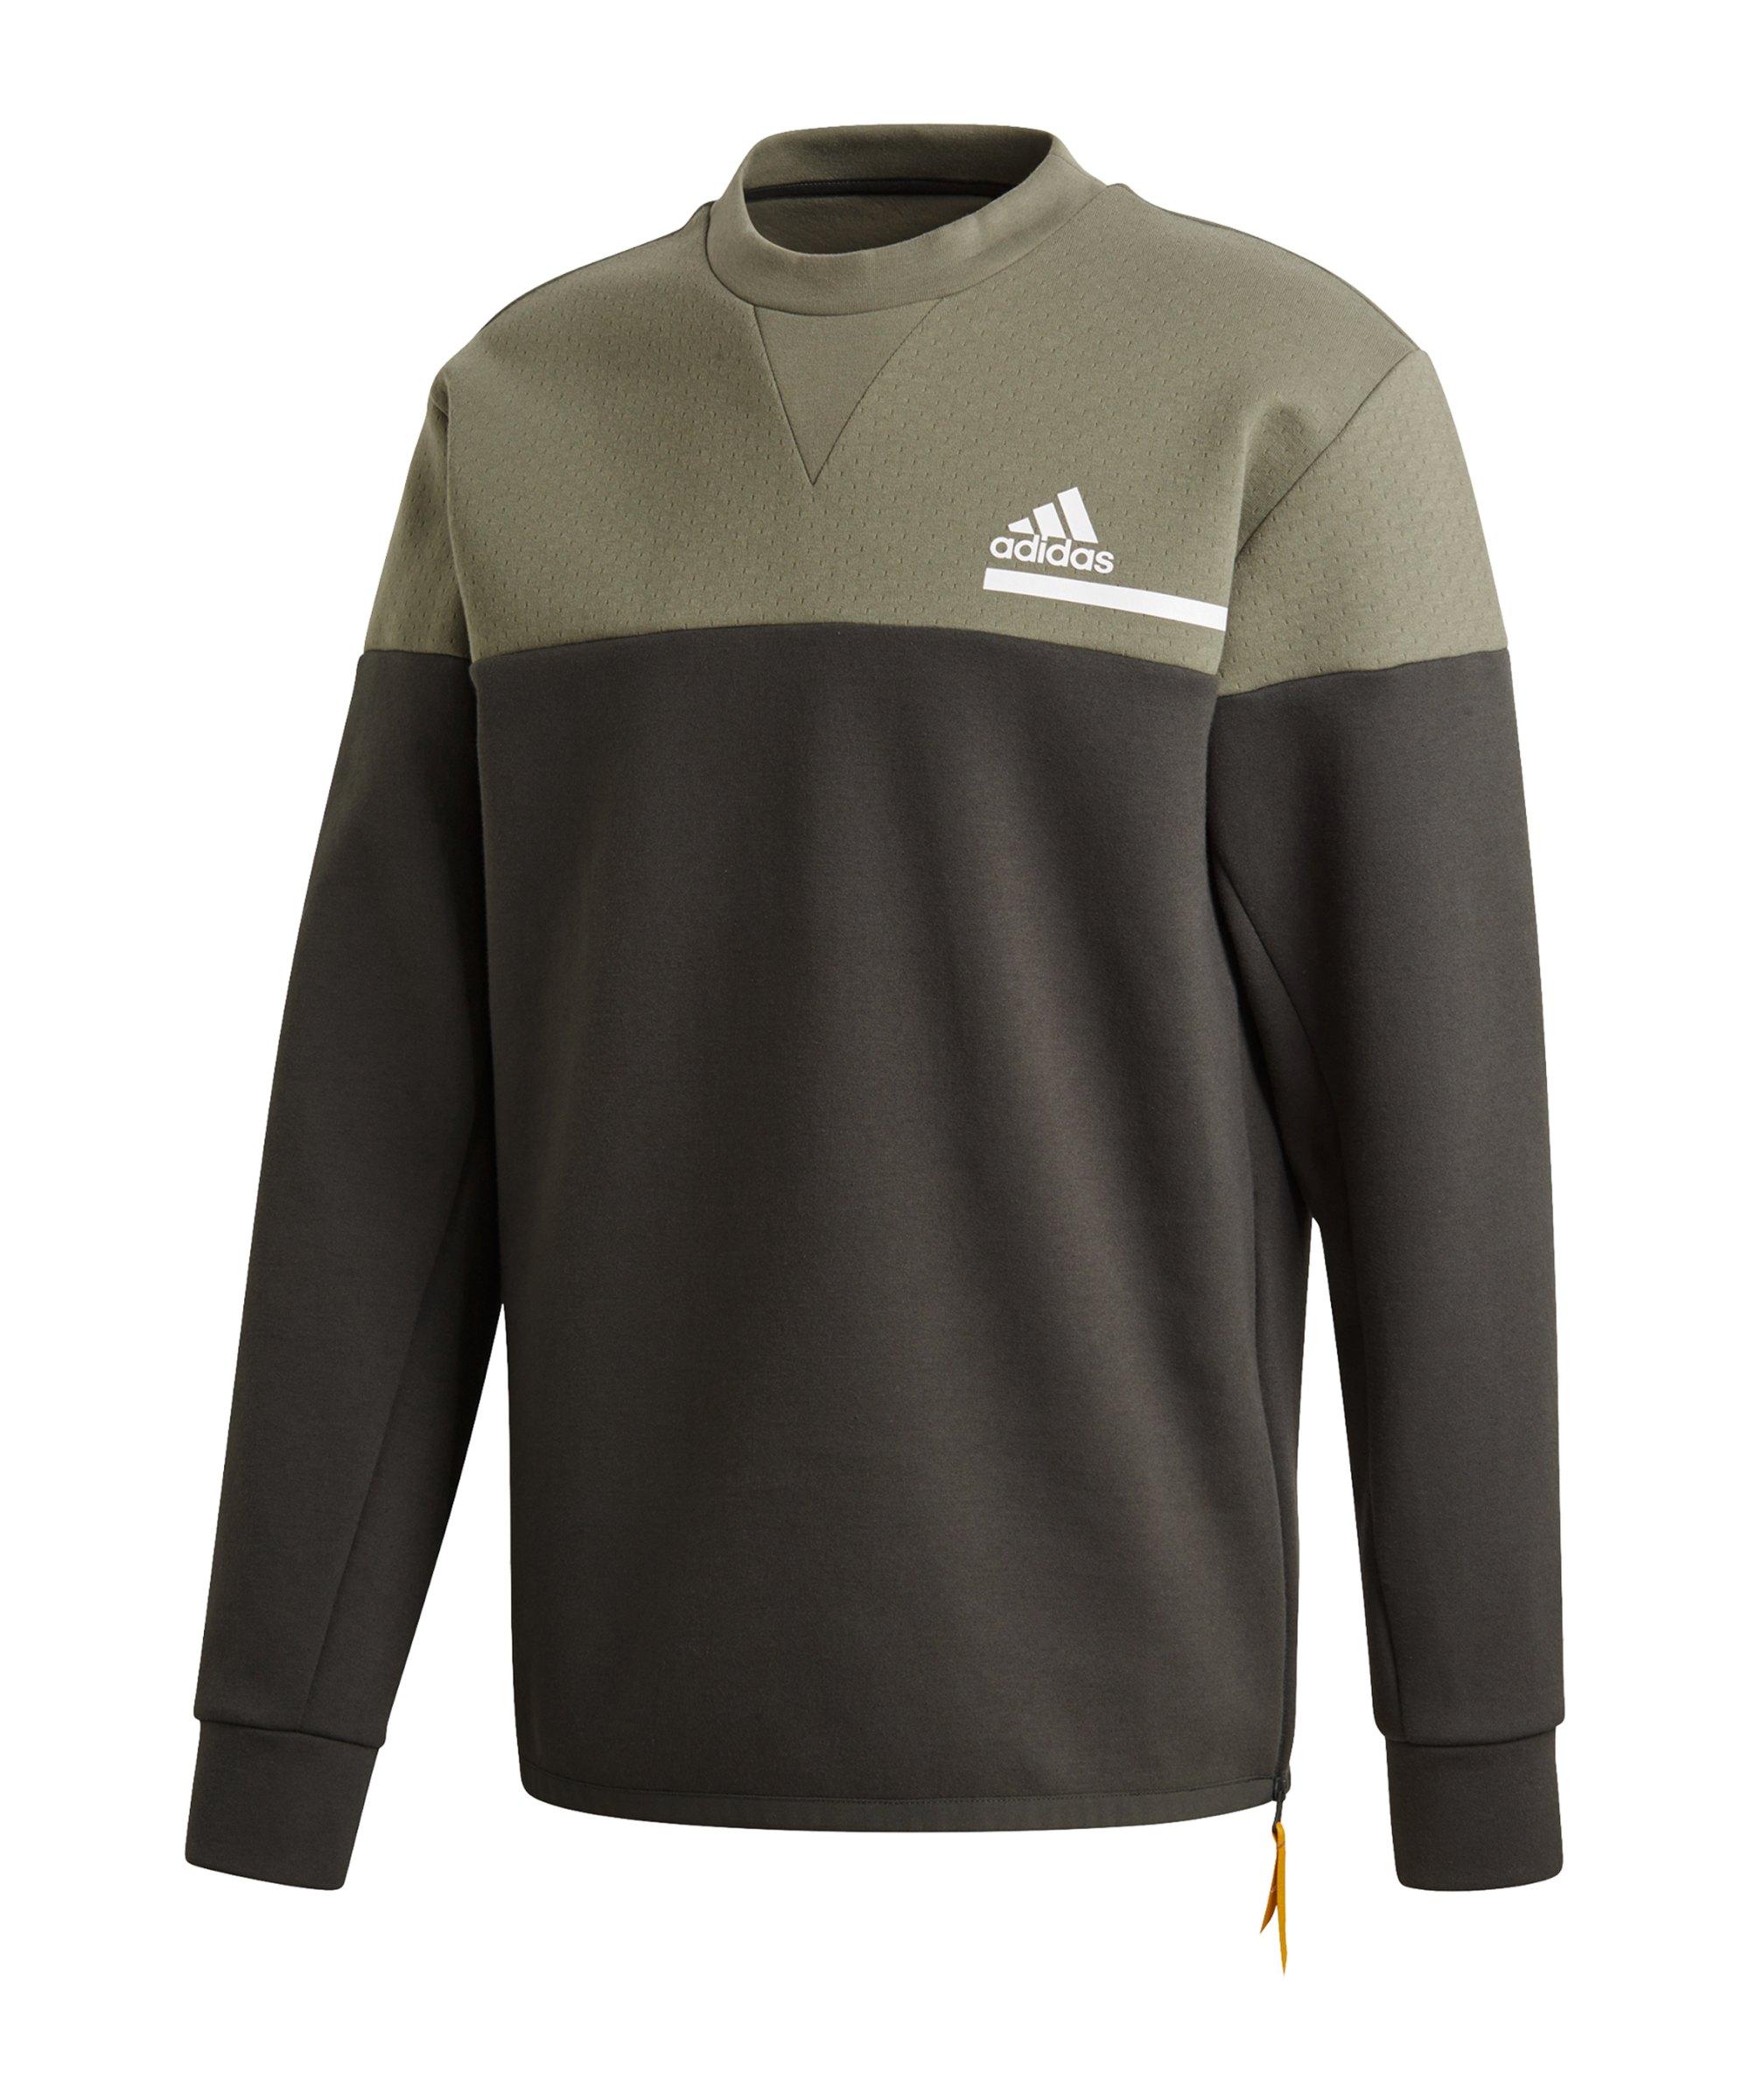 adidas Z.N.E. Crew Sweatshirt Grün - gruen